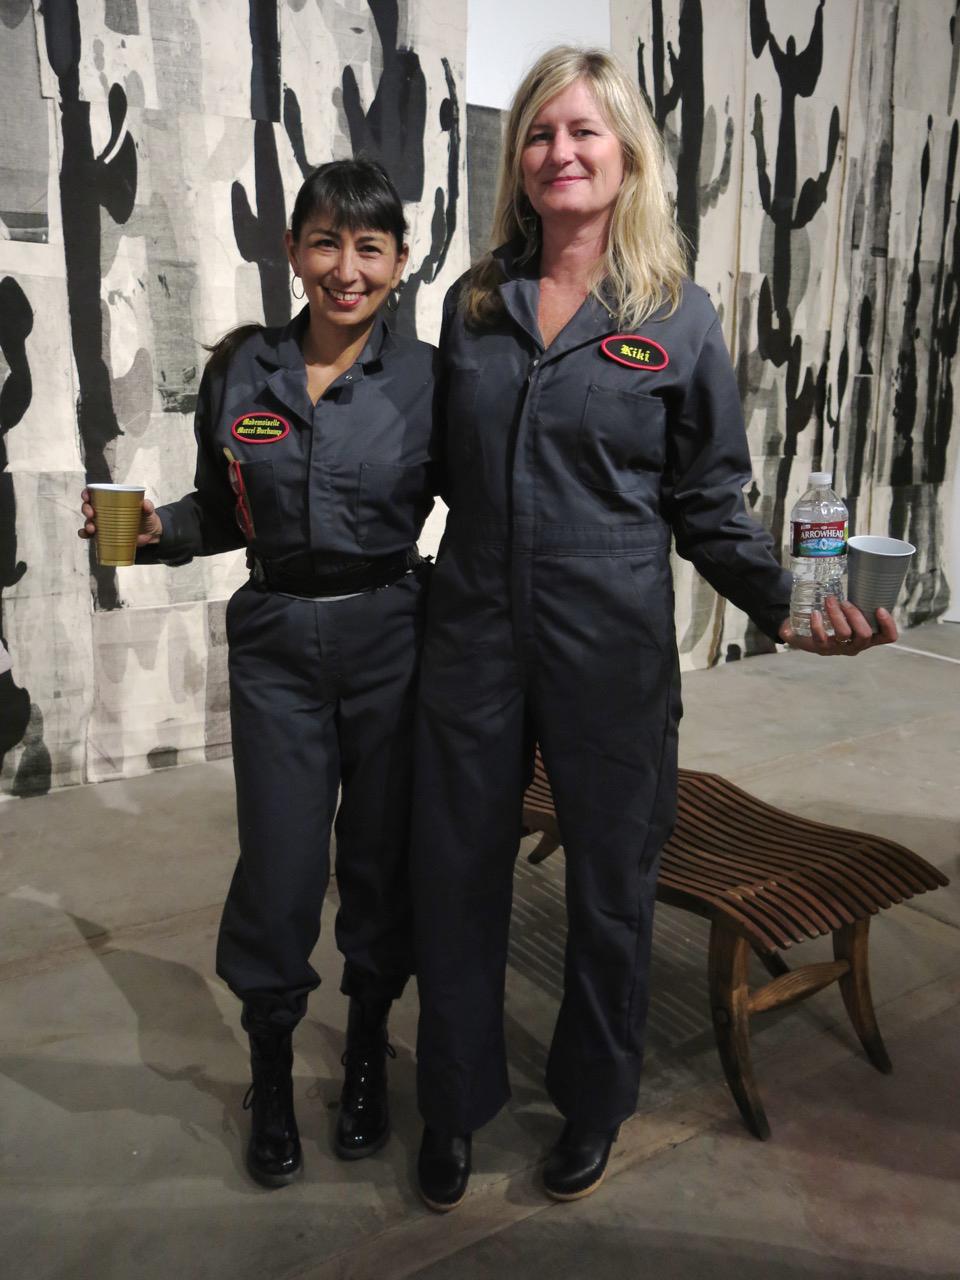 Sydney Cooper & Kristin Bortles